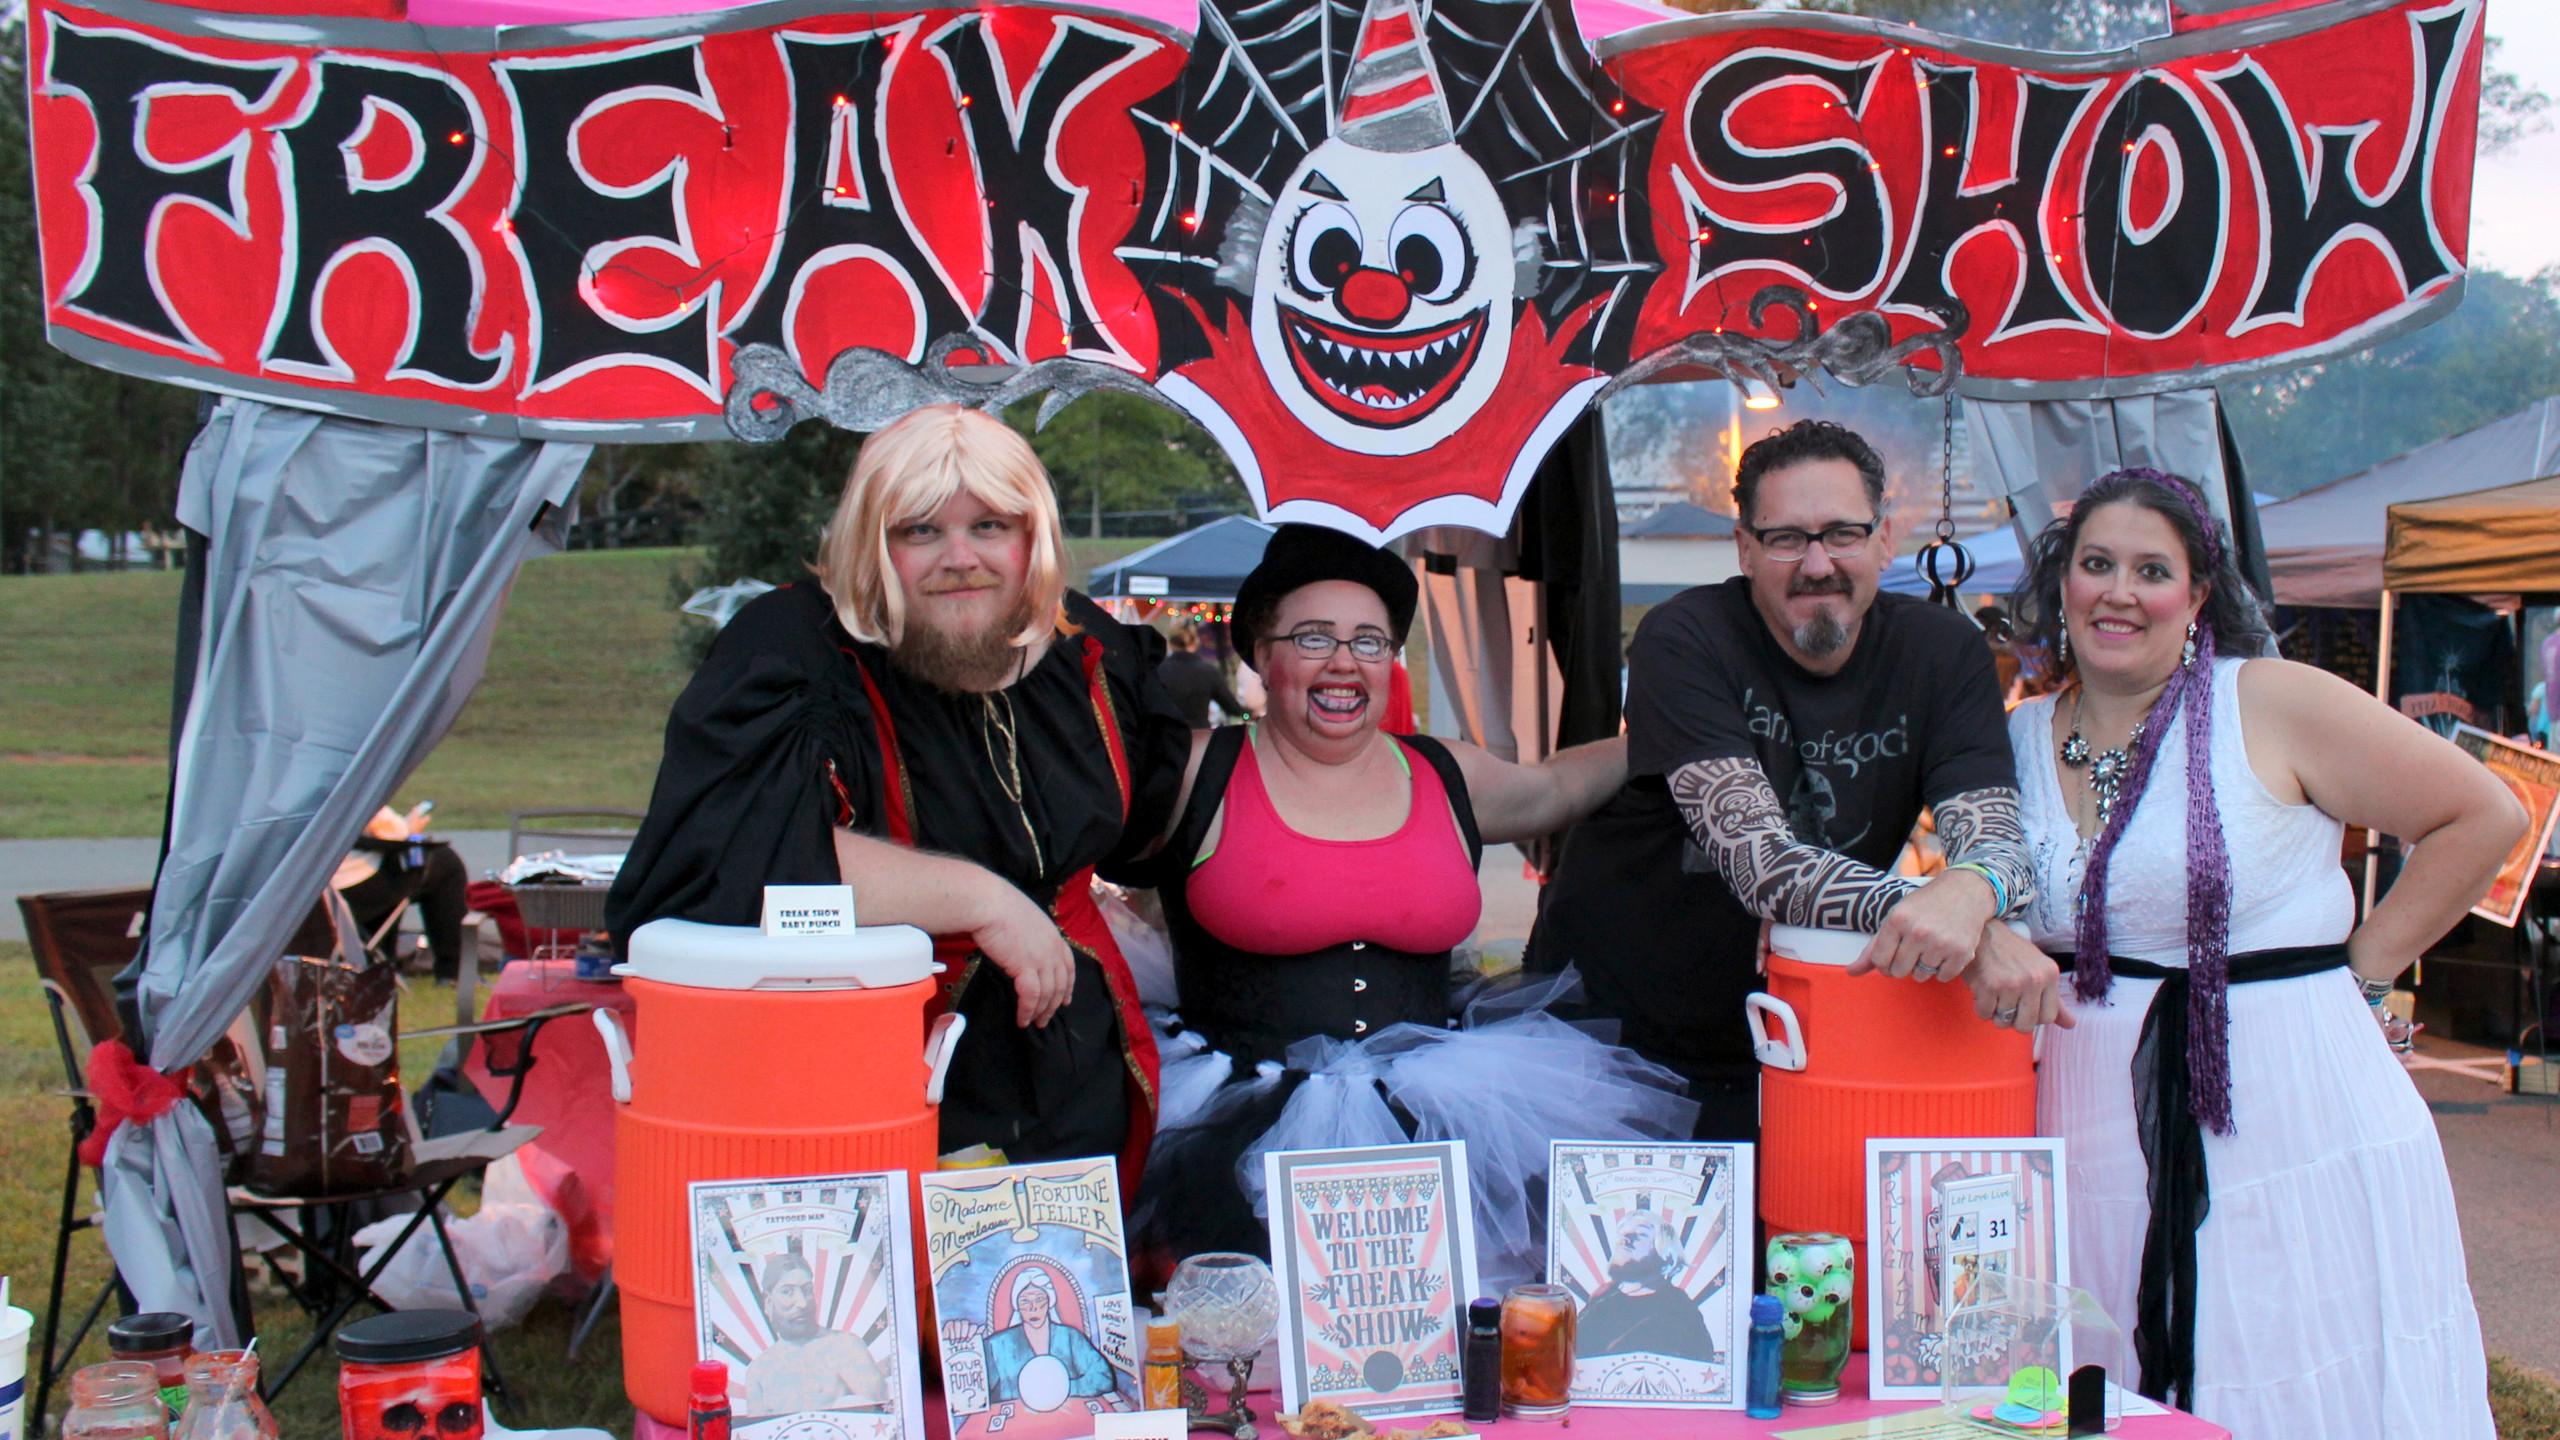 Freak Show Booth